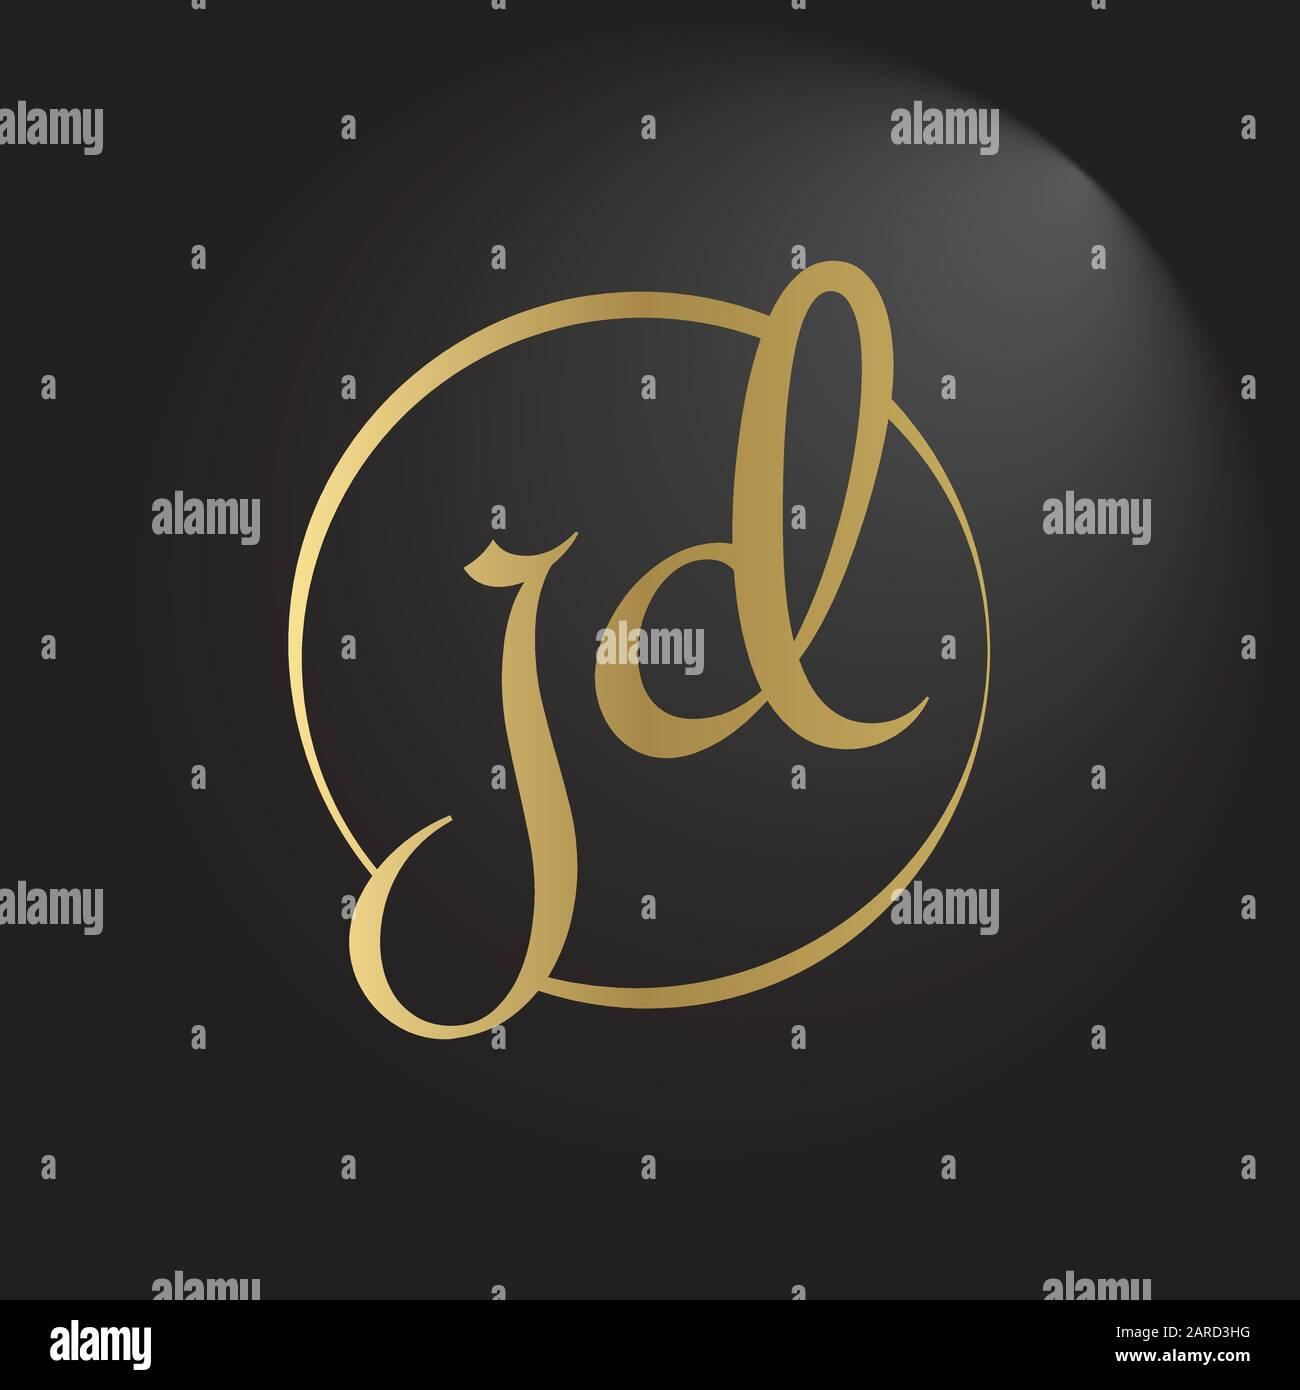 letter jd logo design vector template initial linked letter design jd vector illustration stock vector image art alamy https www alamy com letter jd logo design vector template initial linked letter design jd vector illustration image341422300 html